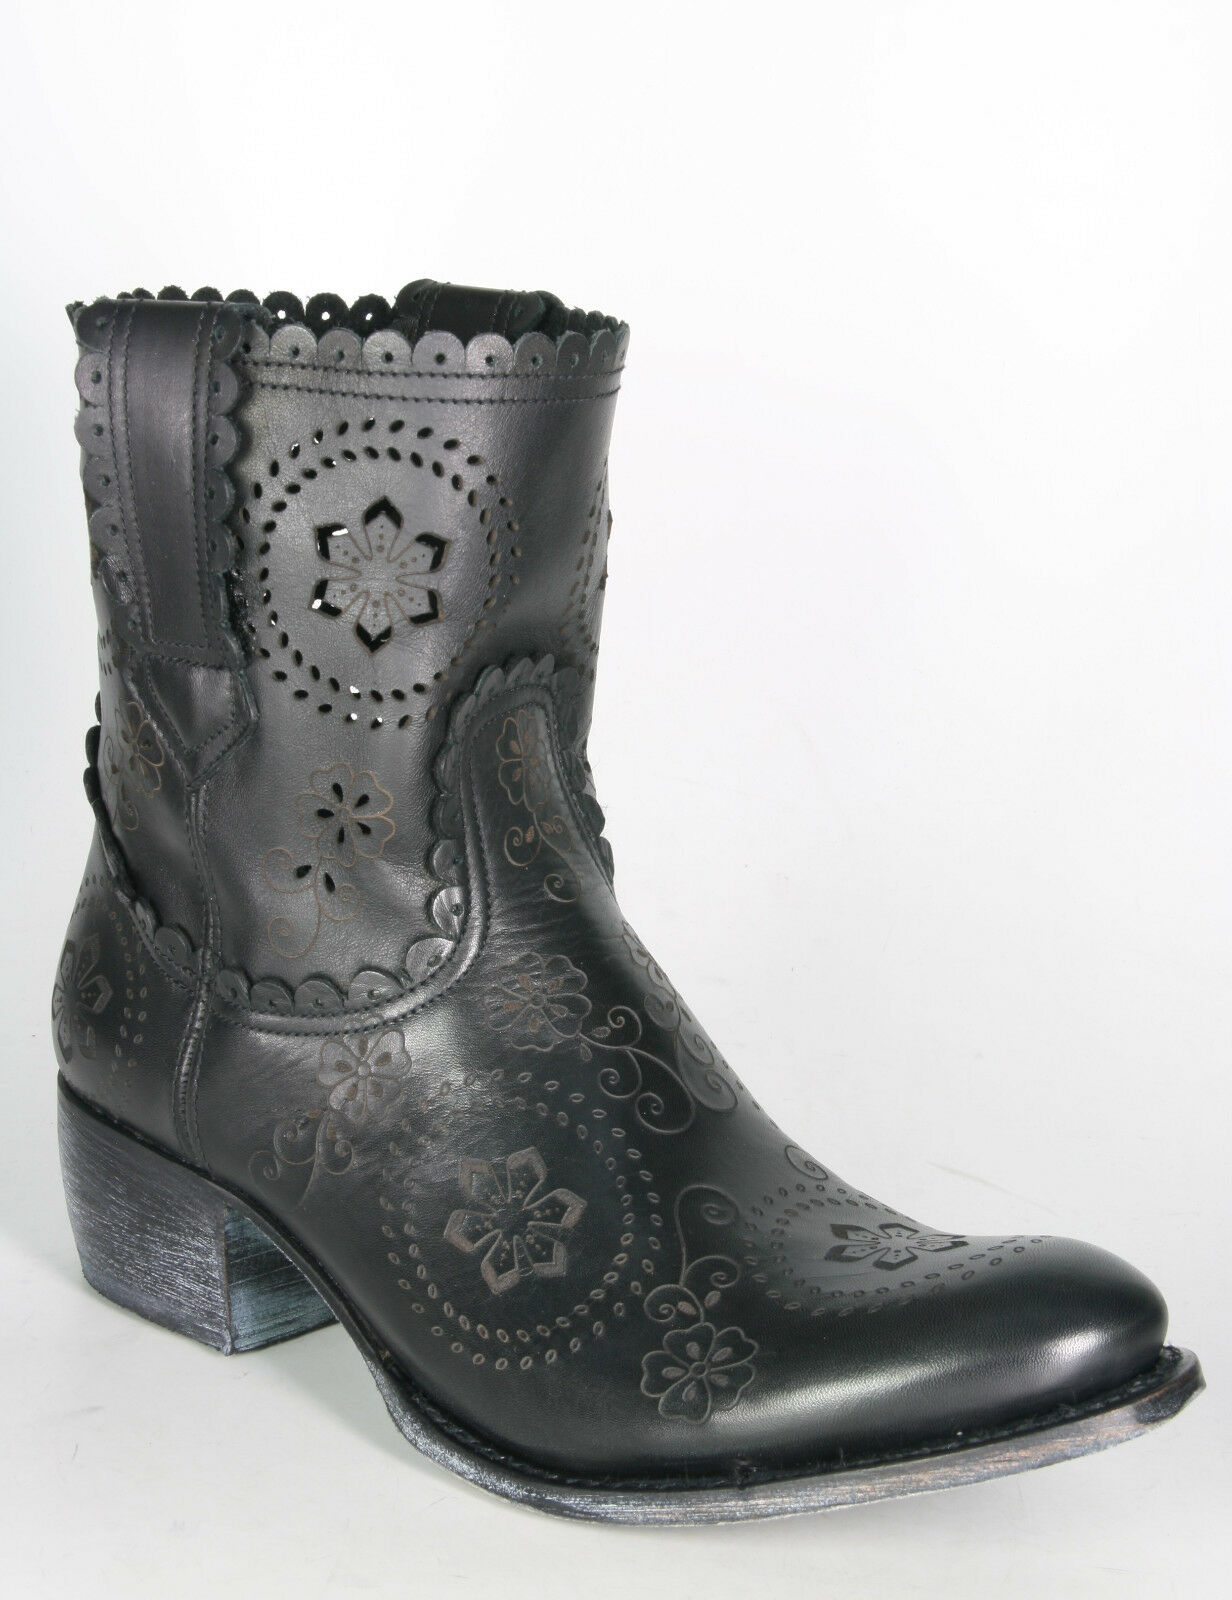 10281 Sendra Stiefeletten schwarz Ankle Stiefel Boho Rahmengenähte Schuhe